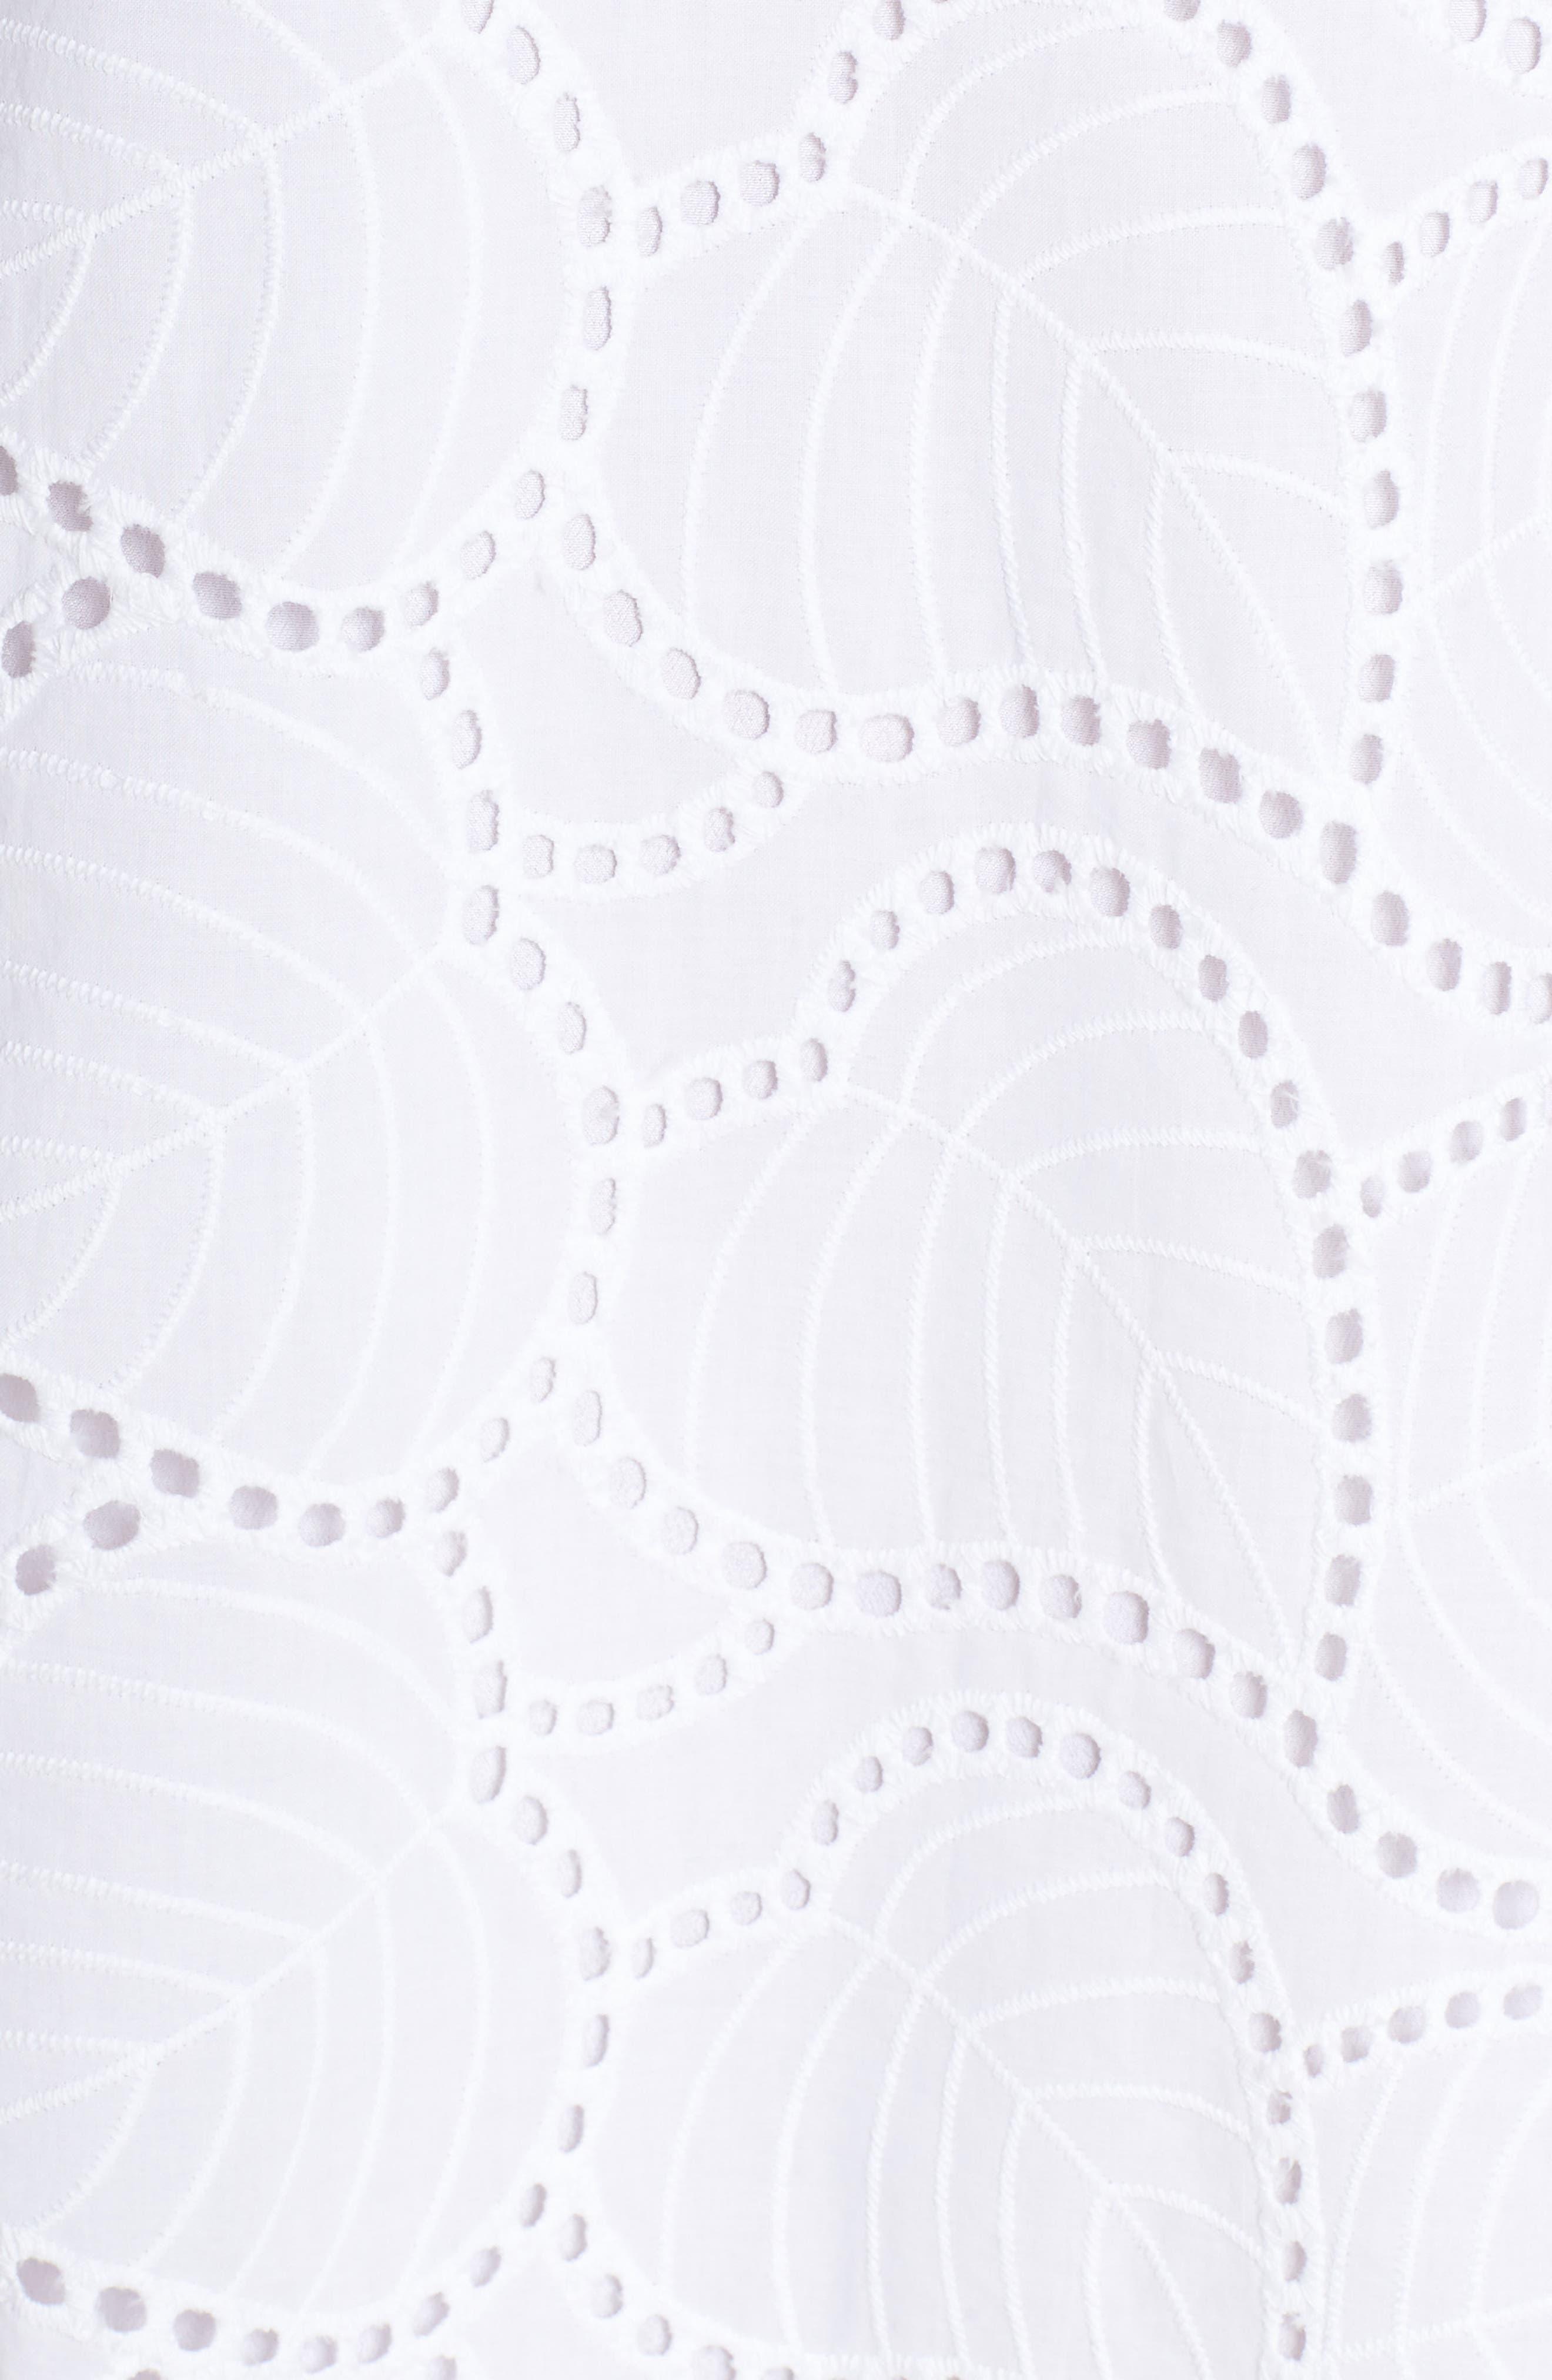 Astara Cotton Eyelet Dress,                             Alternate thumbnail 6, color,                             RESORT WHITE LEAF EYELET